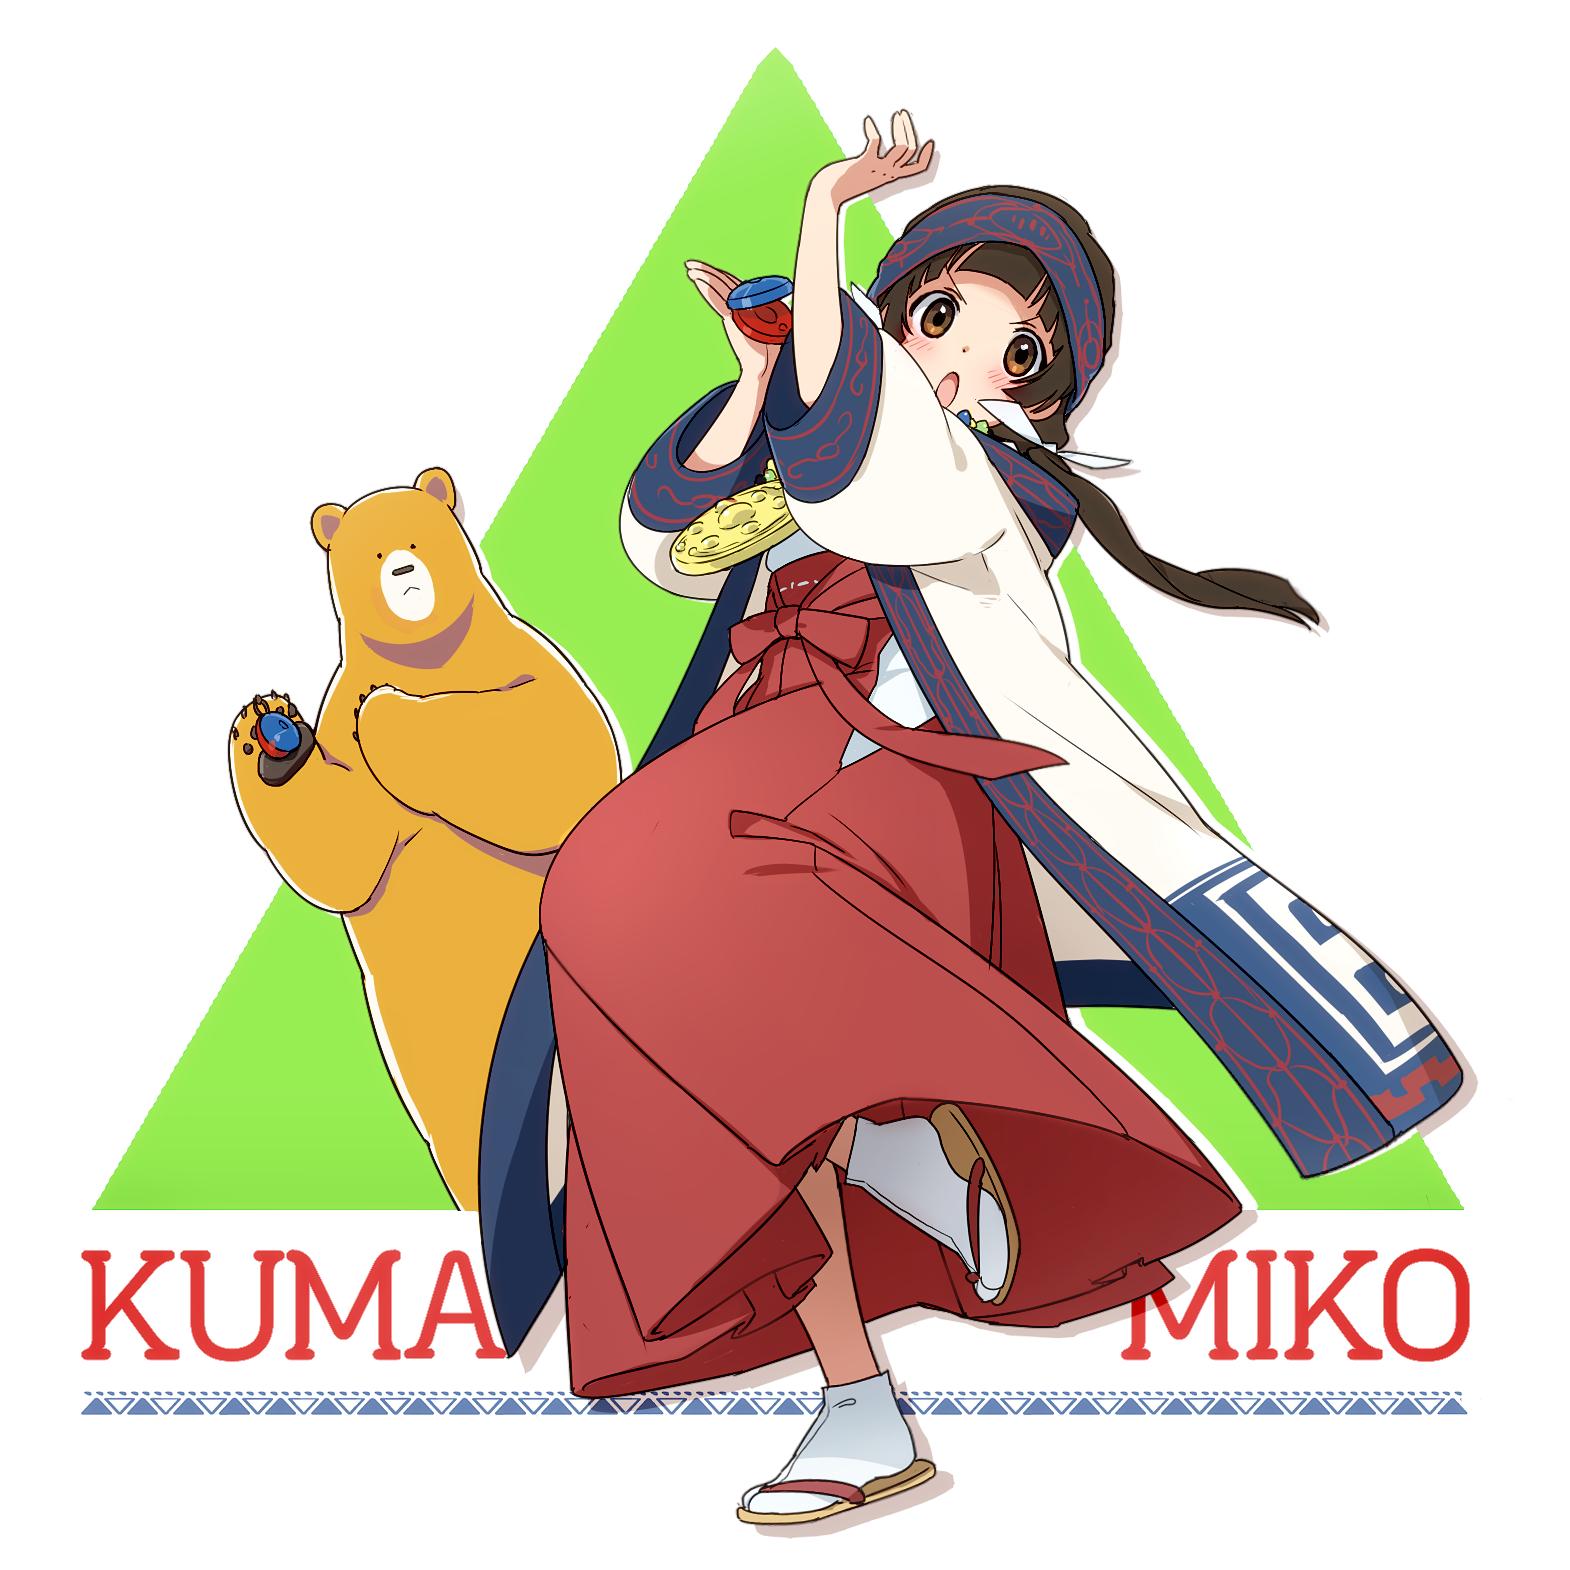 kumamiko-2849978-56473233_p0.png